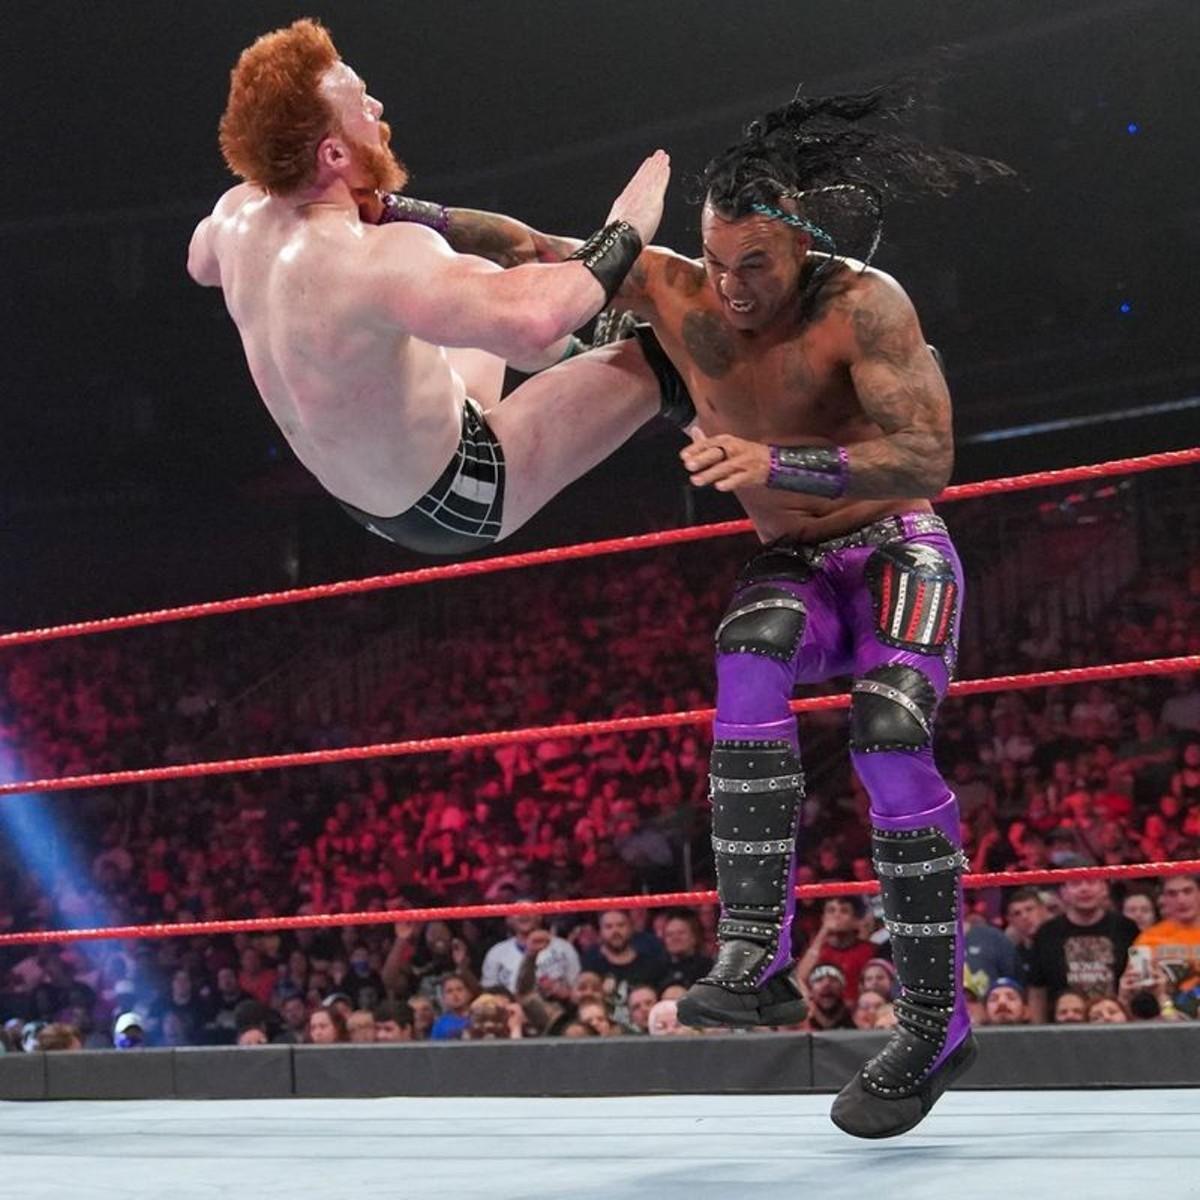 Damian Priest at WWE Monday Night Raw